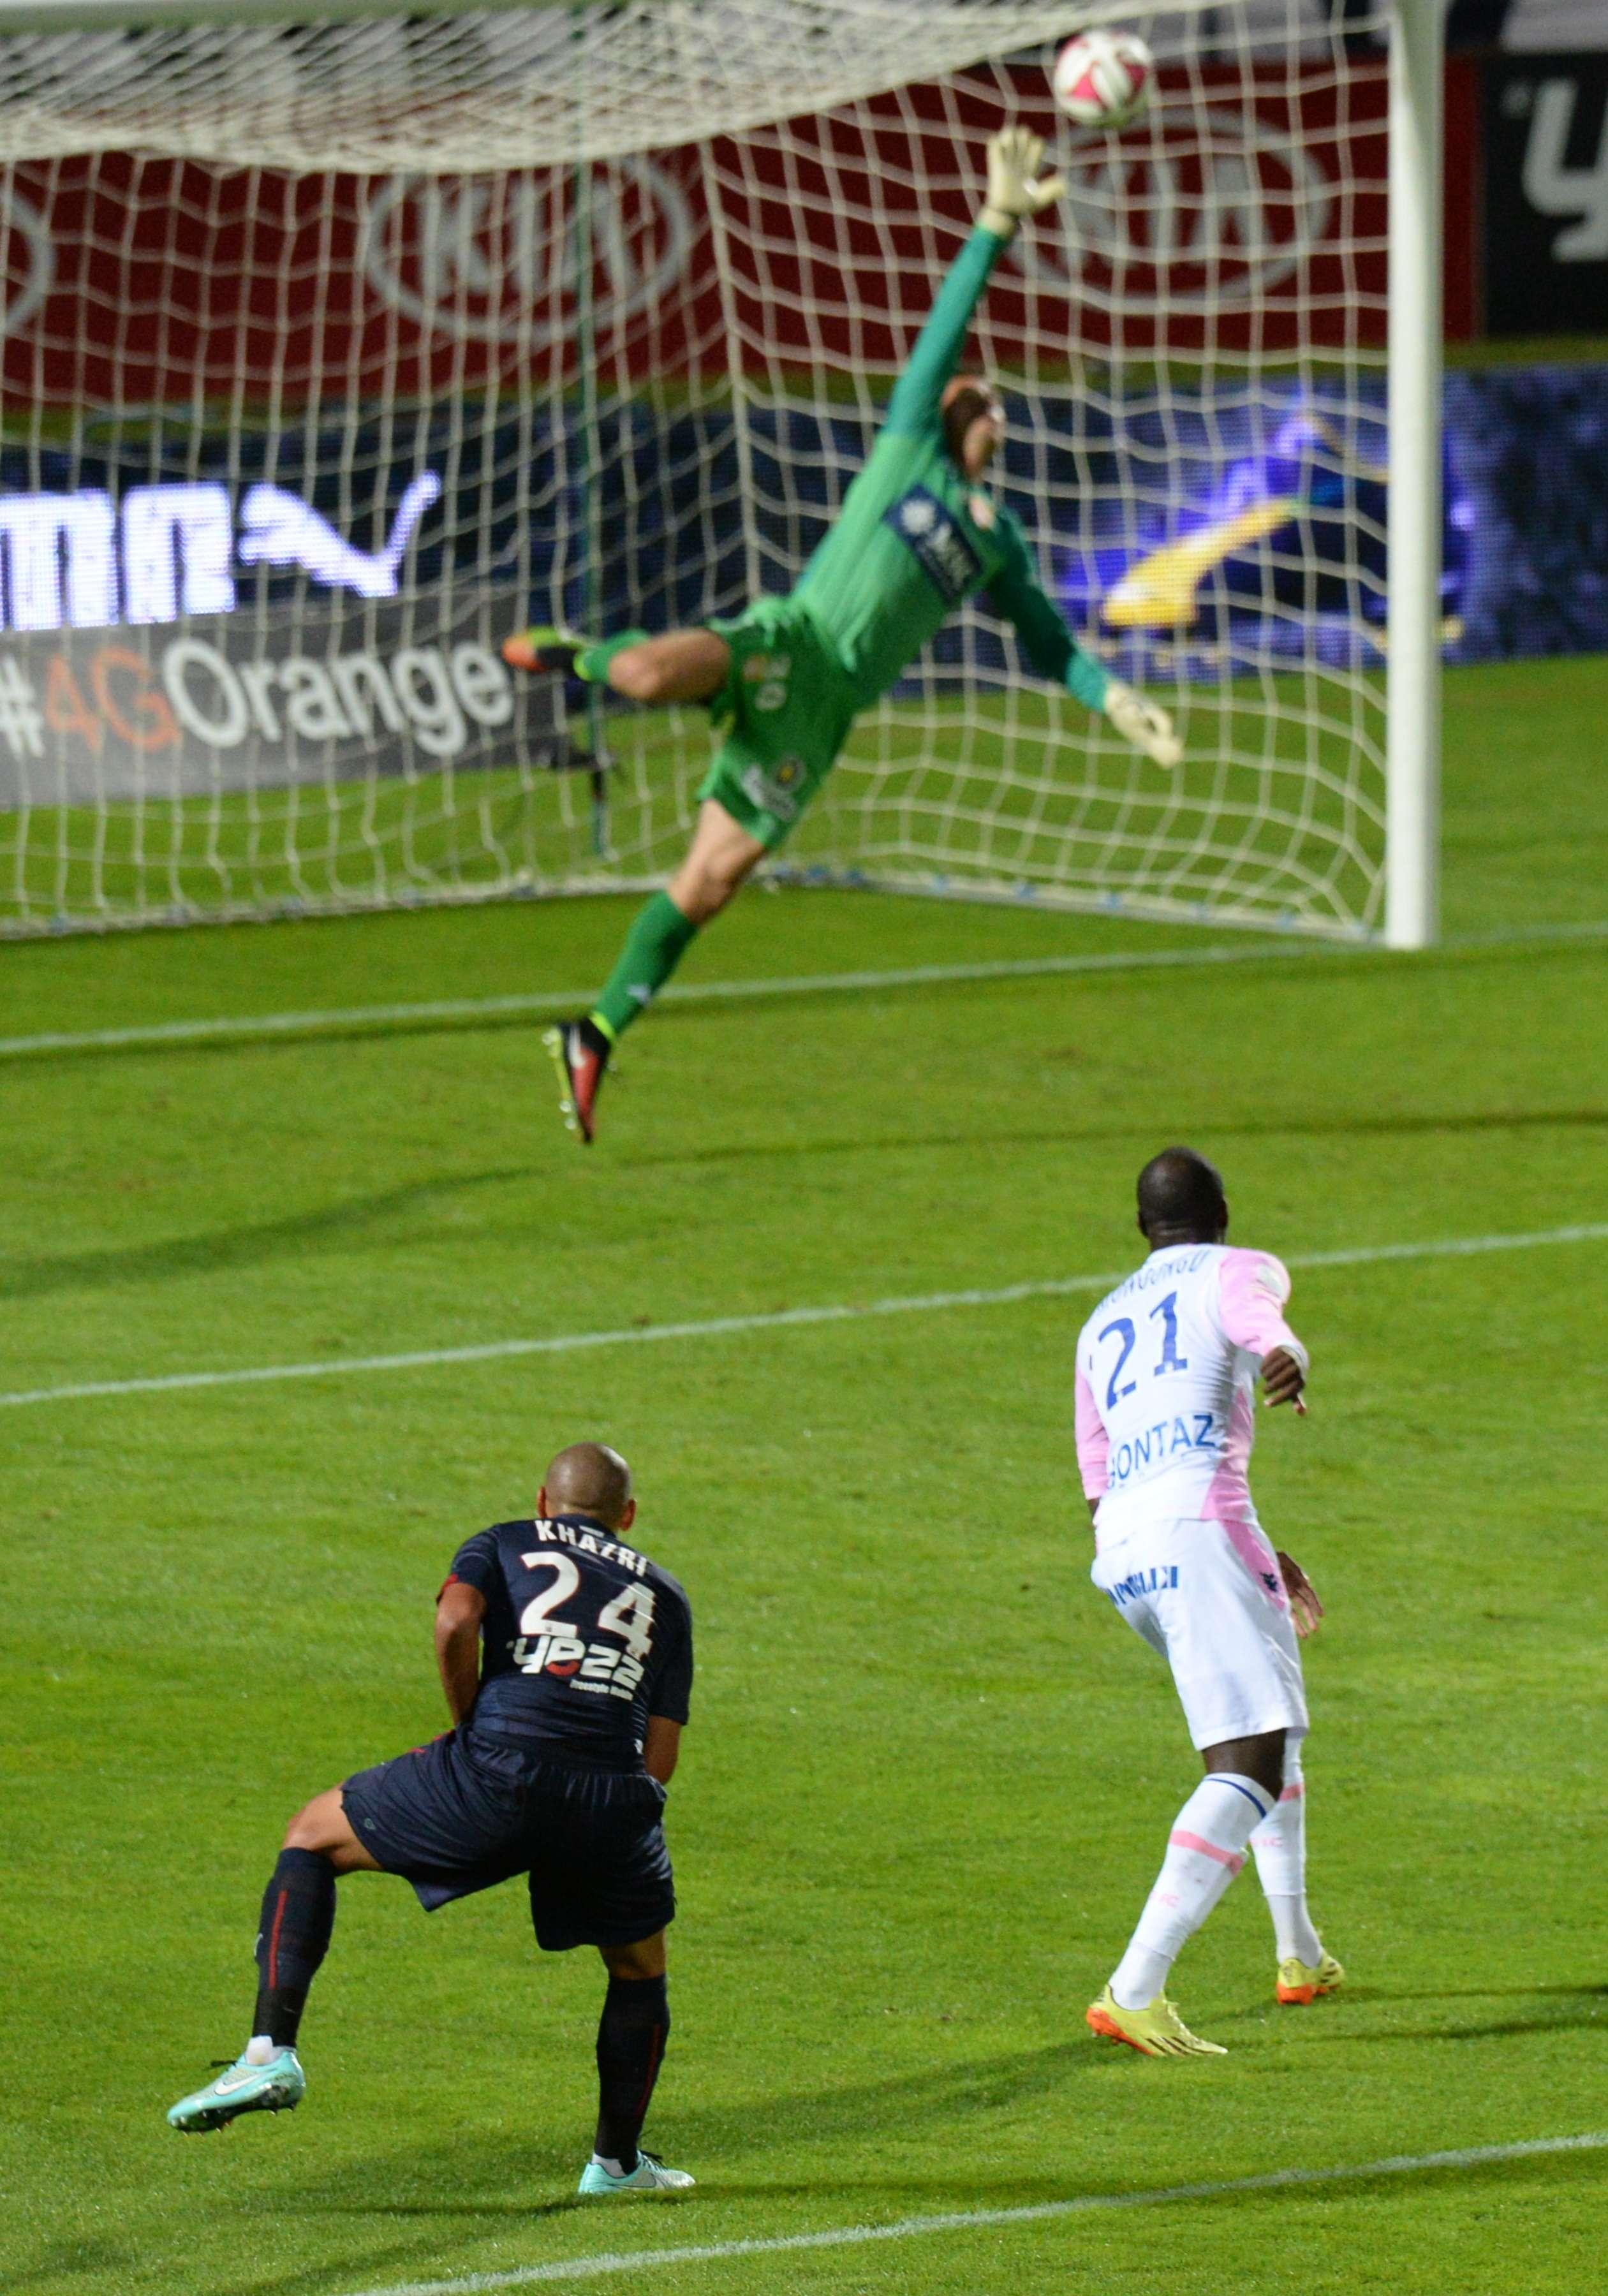 Espectacular gol del del tunecino Wahbi Khazri para el segundo gol del Burdeos en la Liga de Francia. Foto: AFP